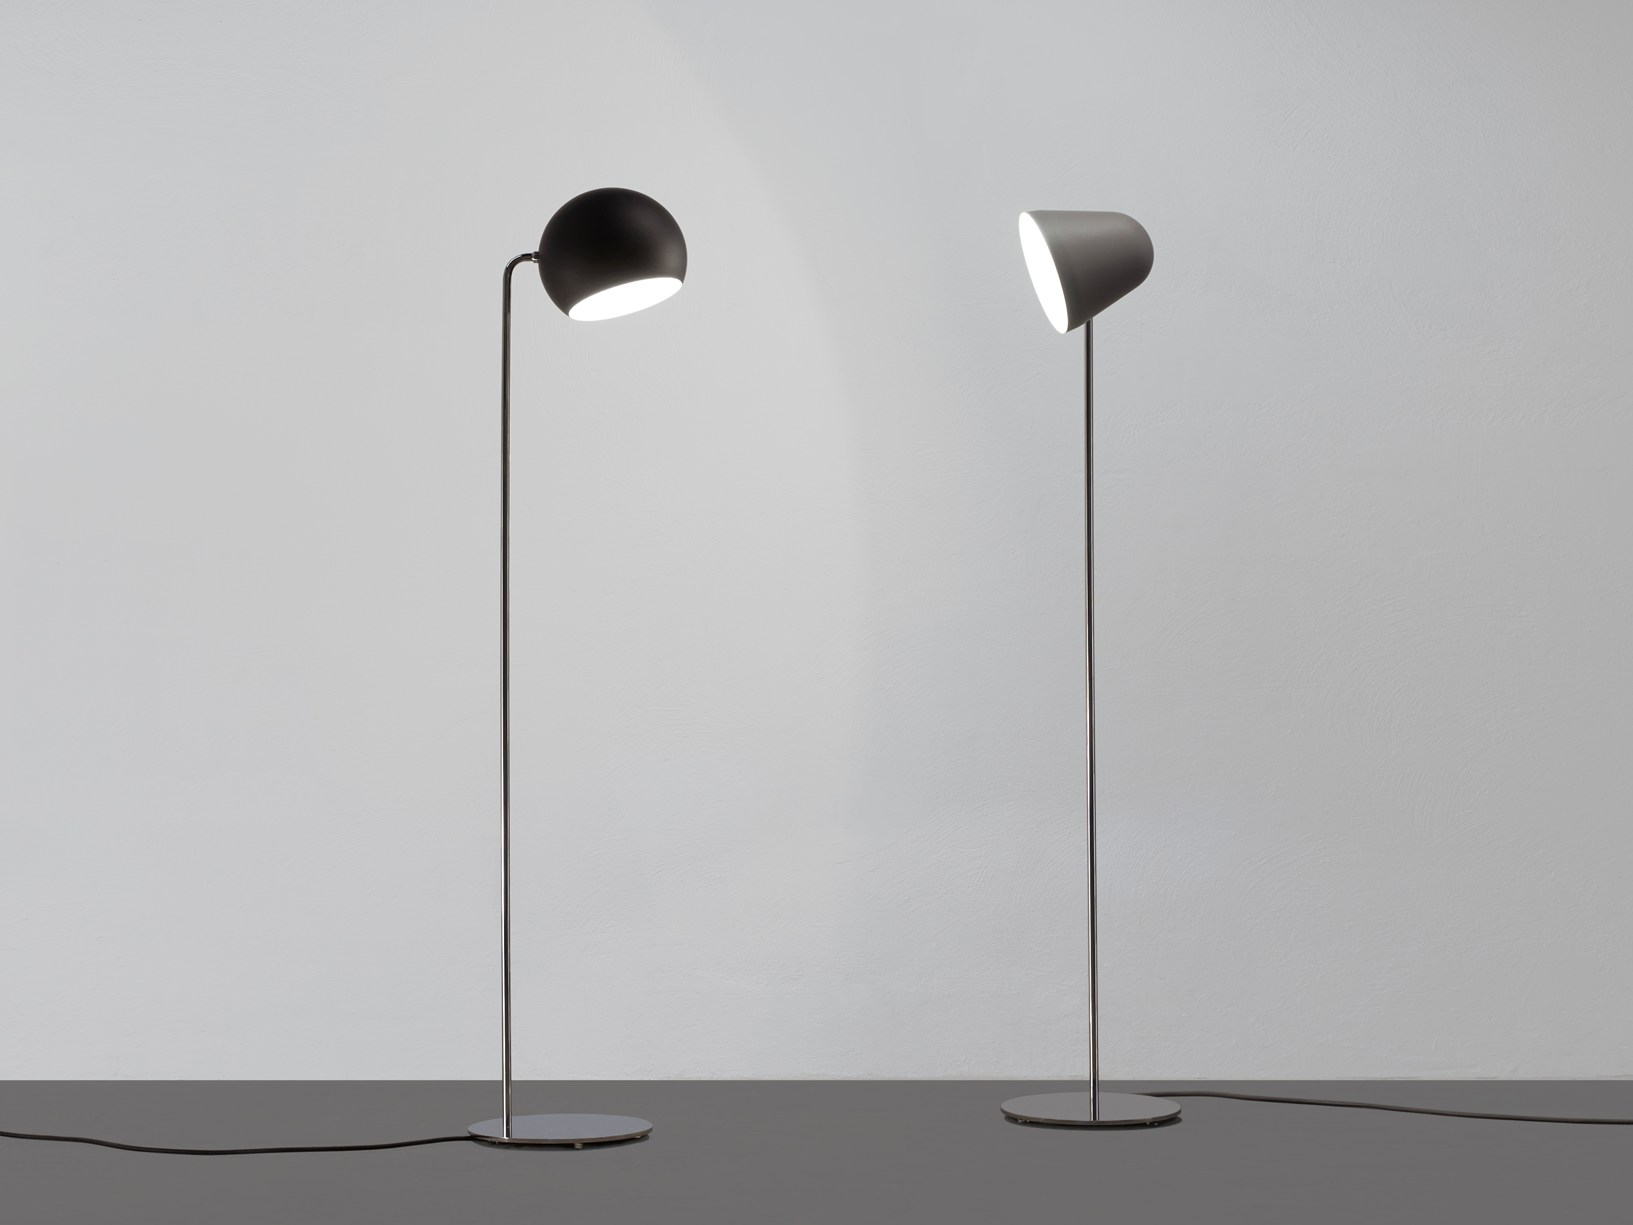 Tilt Floor Lamps by Nyta